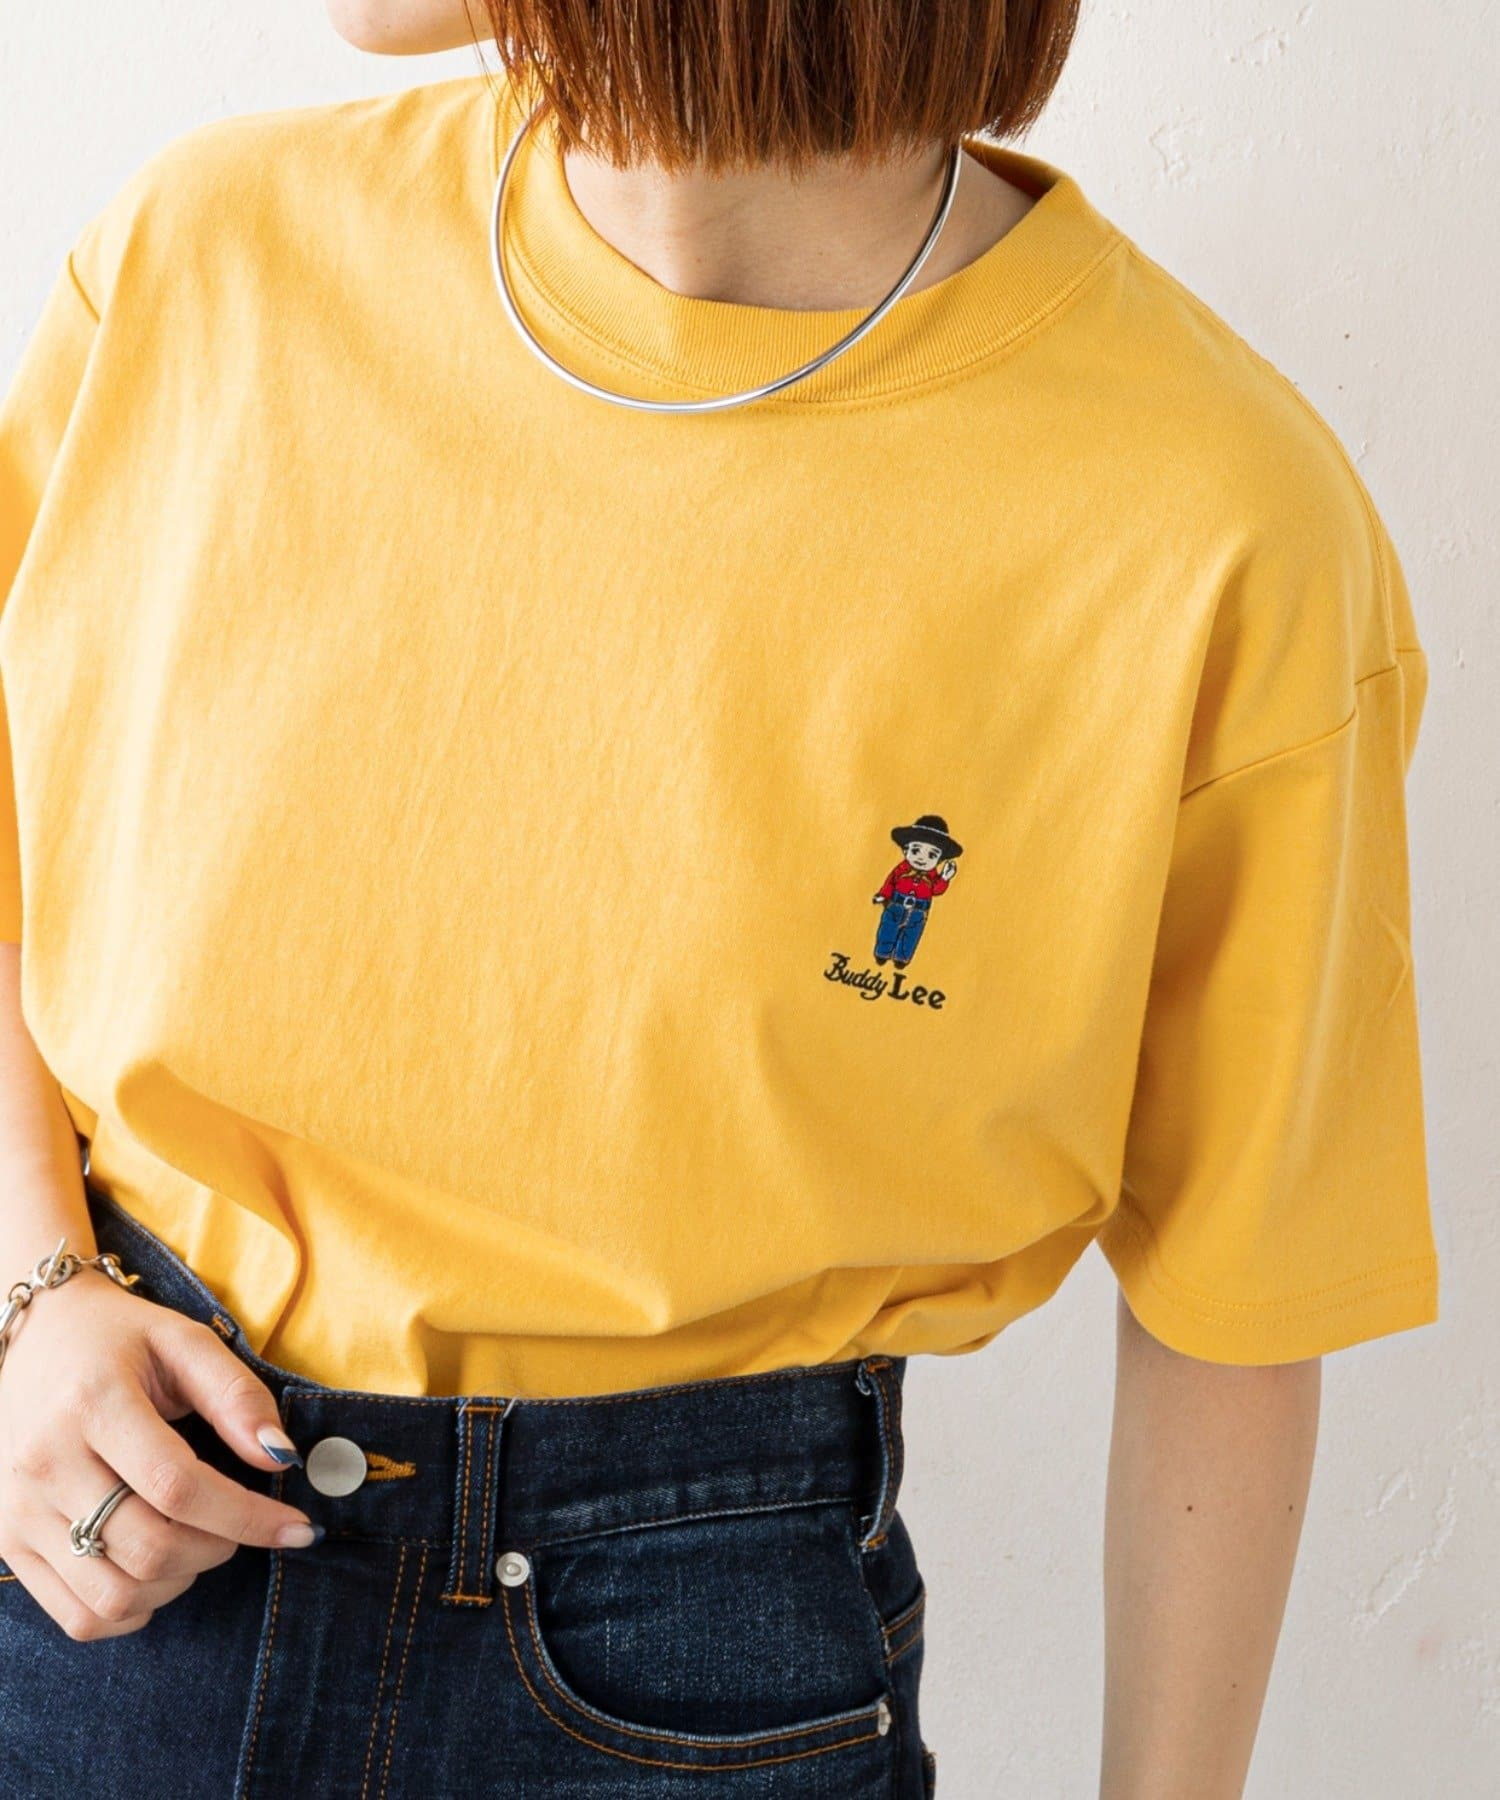 CIAOPANIC TYPY(チャオパニックティピー) レディース 【Lee×CIAOPANIC TYPY】BuddyLee刺繍Tee イエロー